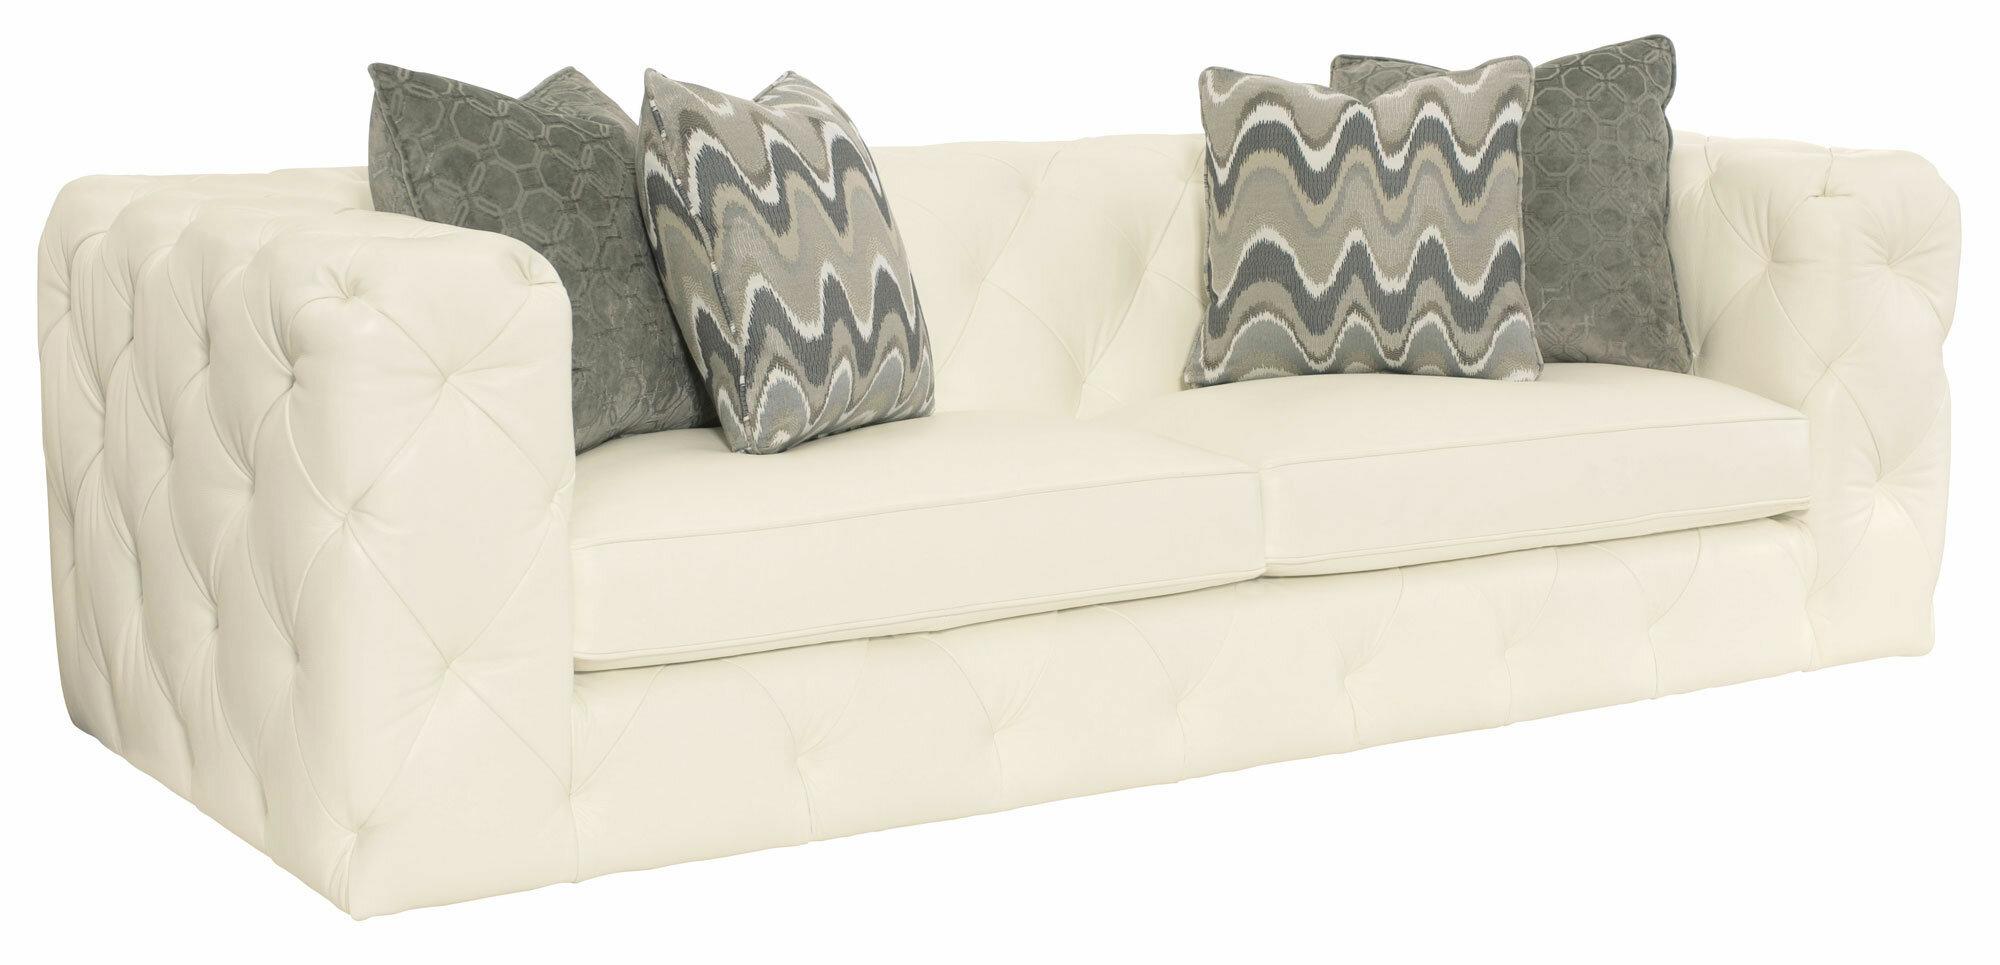 Sensational Chelsea Leather Sofa Pdpeps Interior Chair Design Pdpepsorg